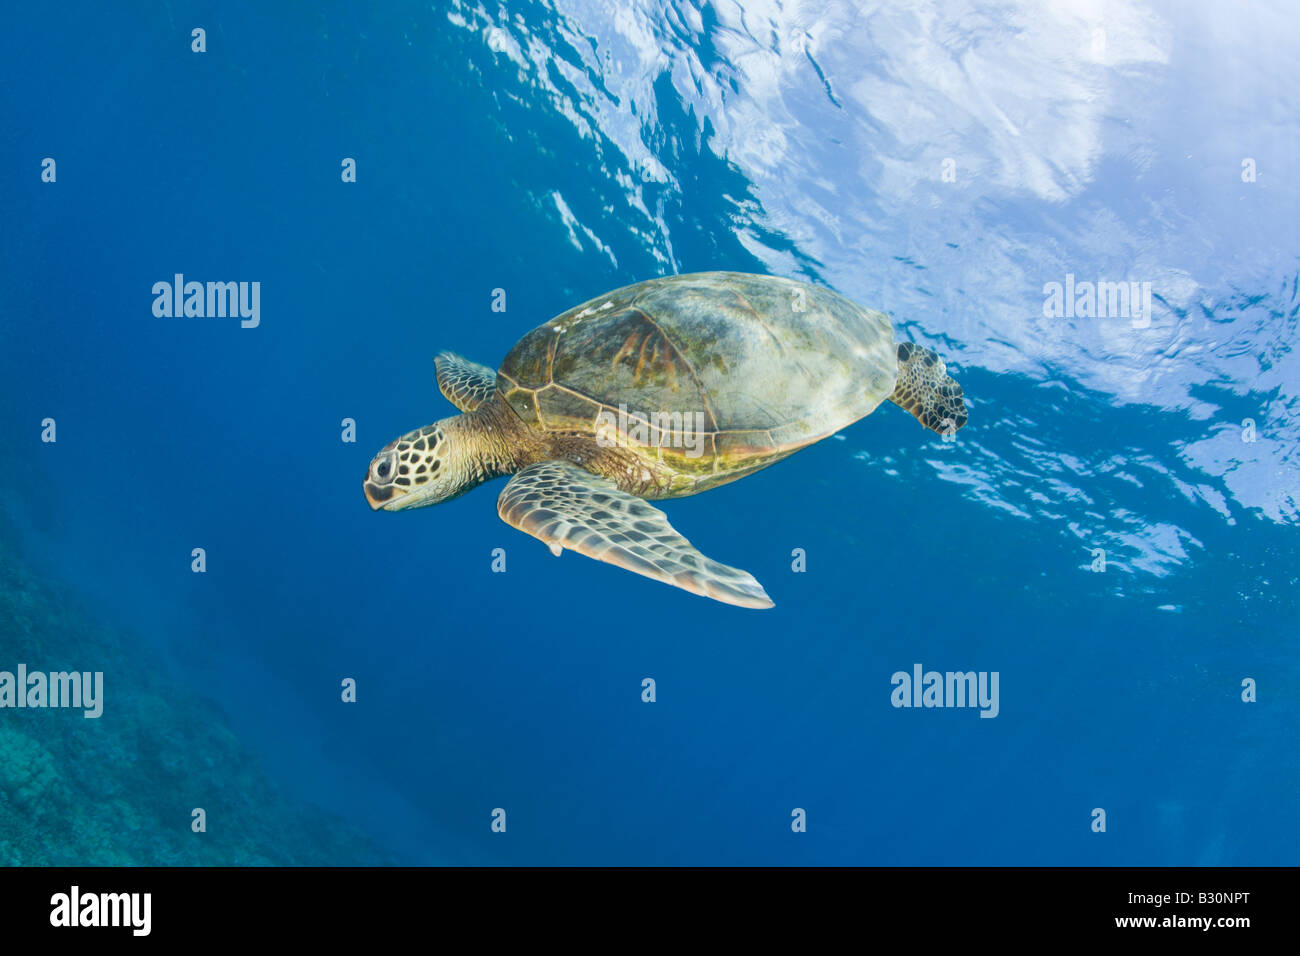 Tortuga verde Chelonia mydas atolón Bikini de las Islas Marshall Micronesia Océano Pacífico Foto de stock